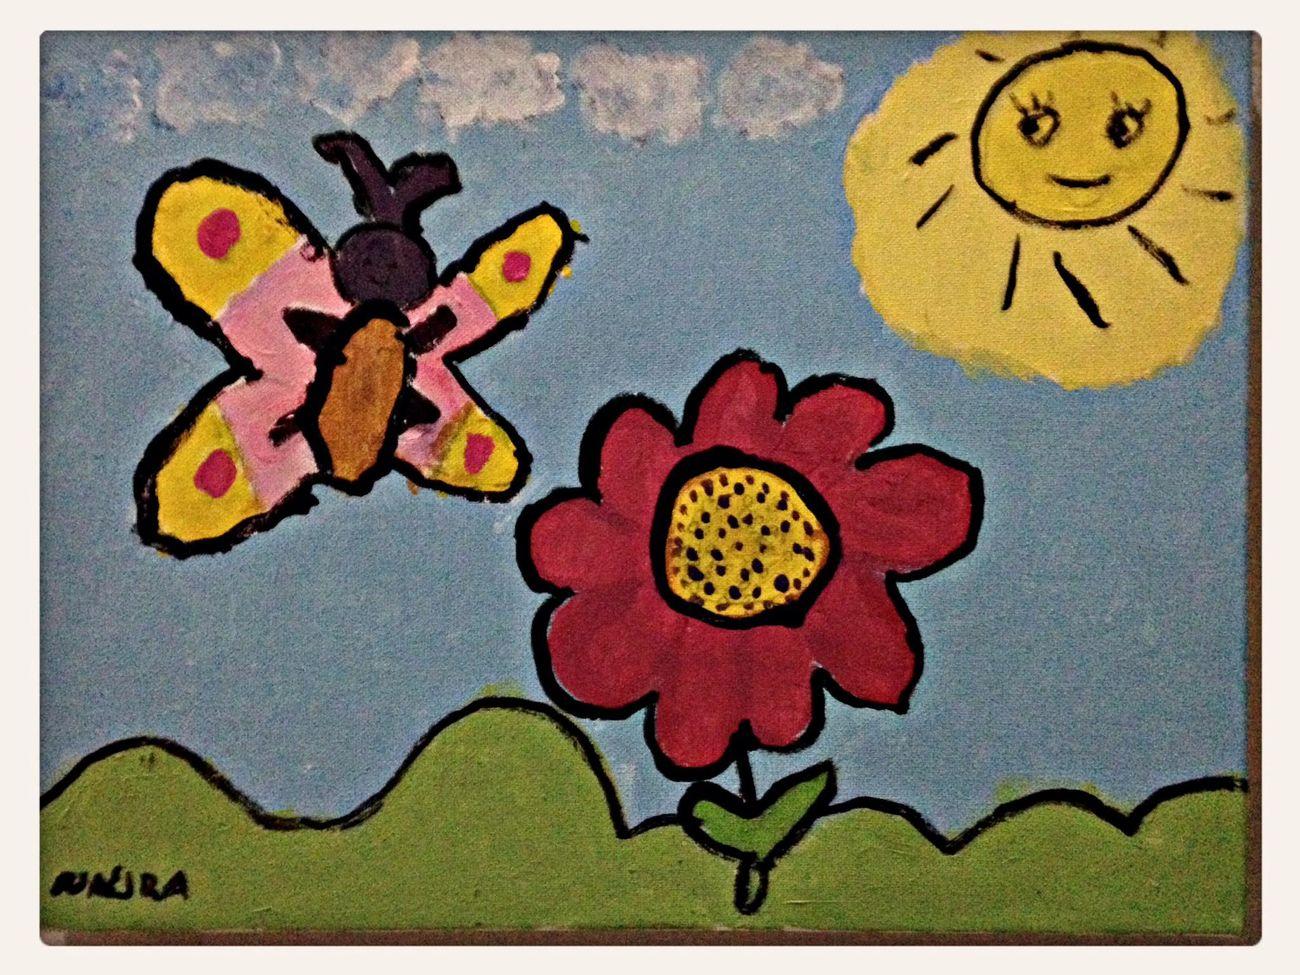 Naurania Kids' Artwork Hadiprana Arylic